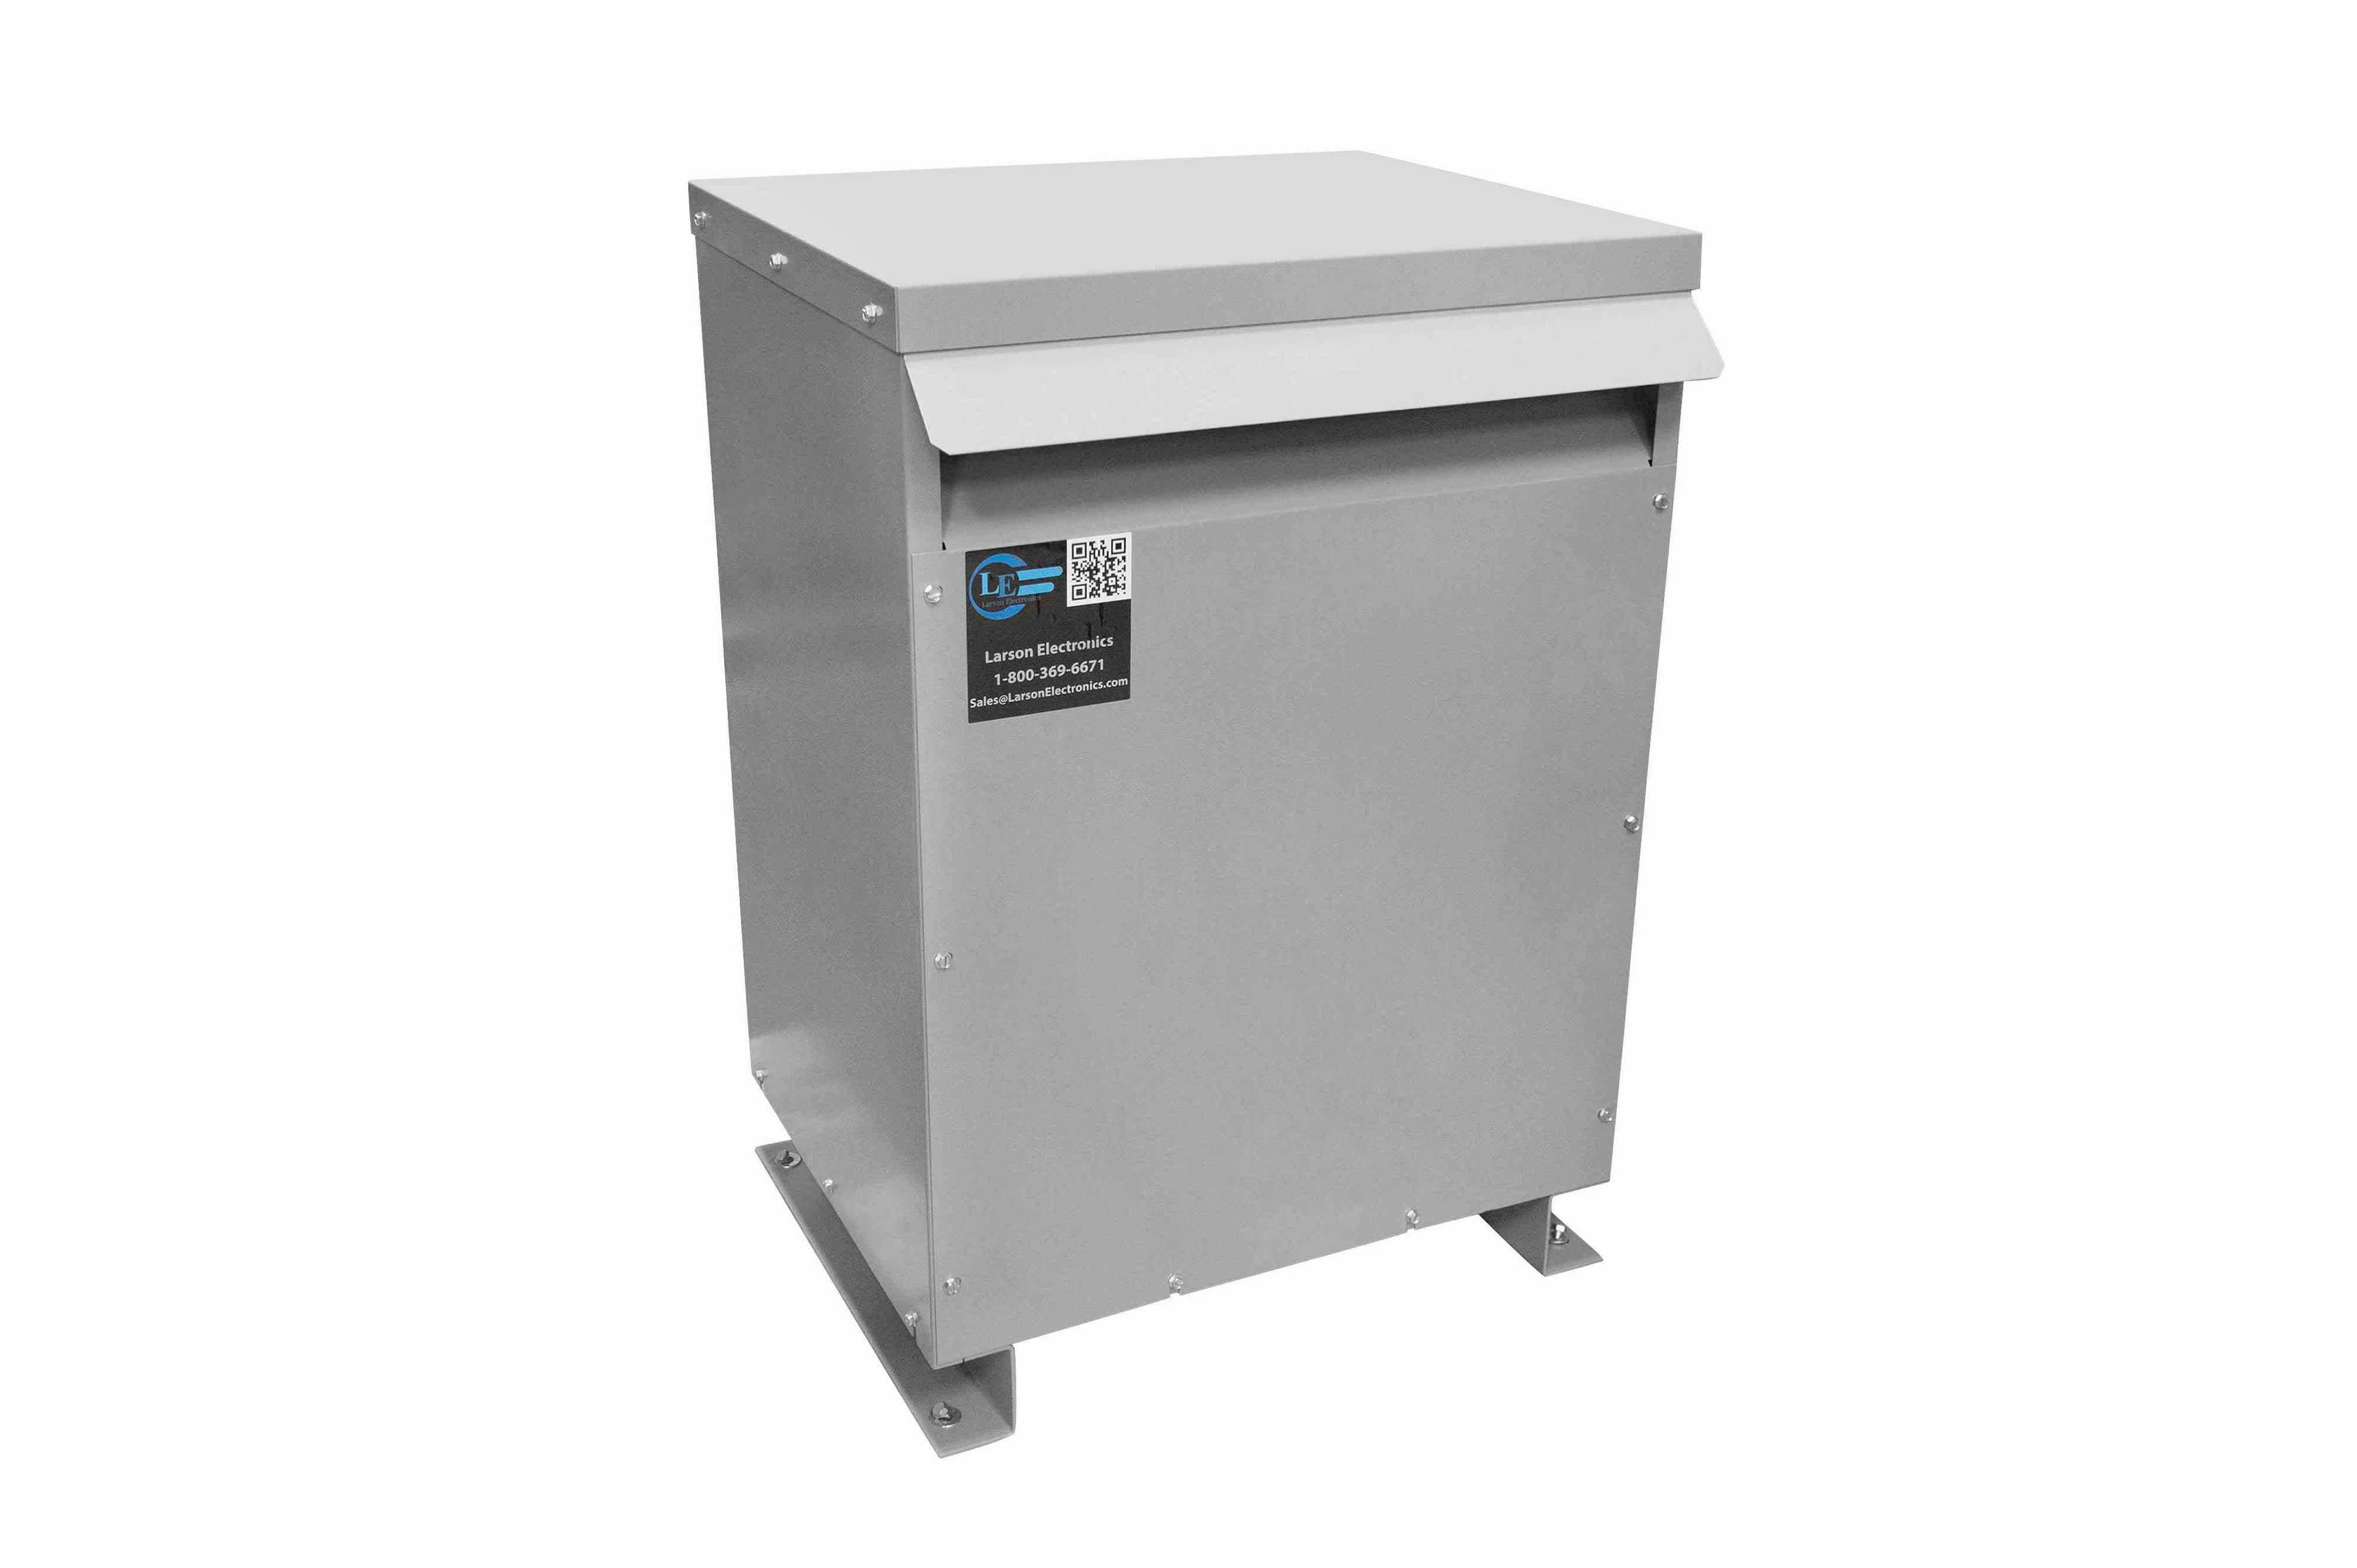 32.5 kVA 3PH Isolation Transformer, 415V Wye Primary, 208Y/120 Wye-N Secondary, N3R, Ventilated, 60 Hz